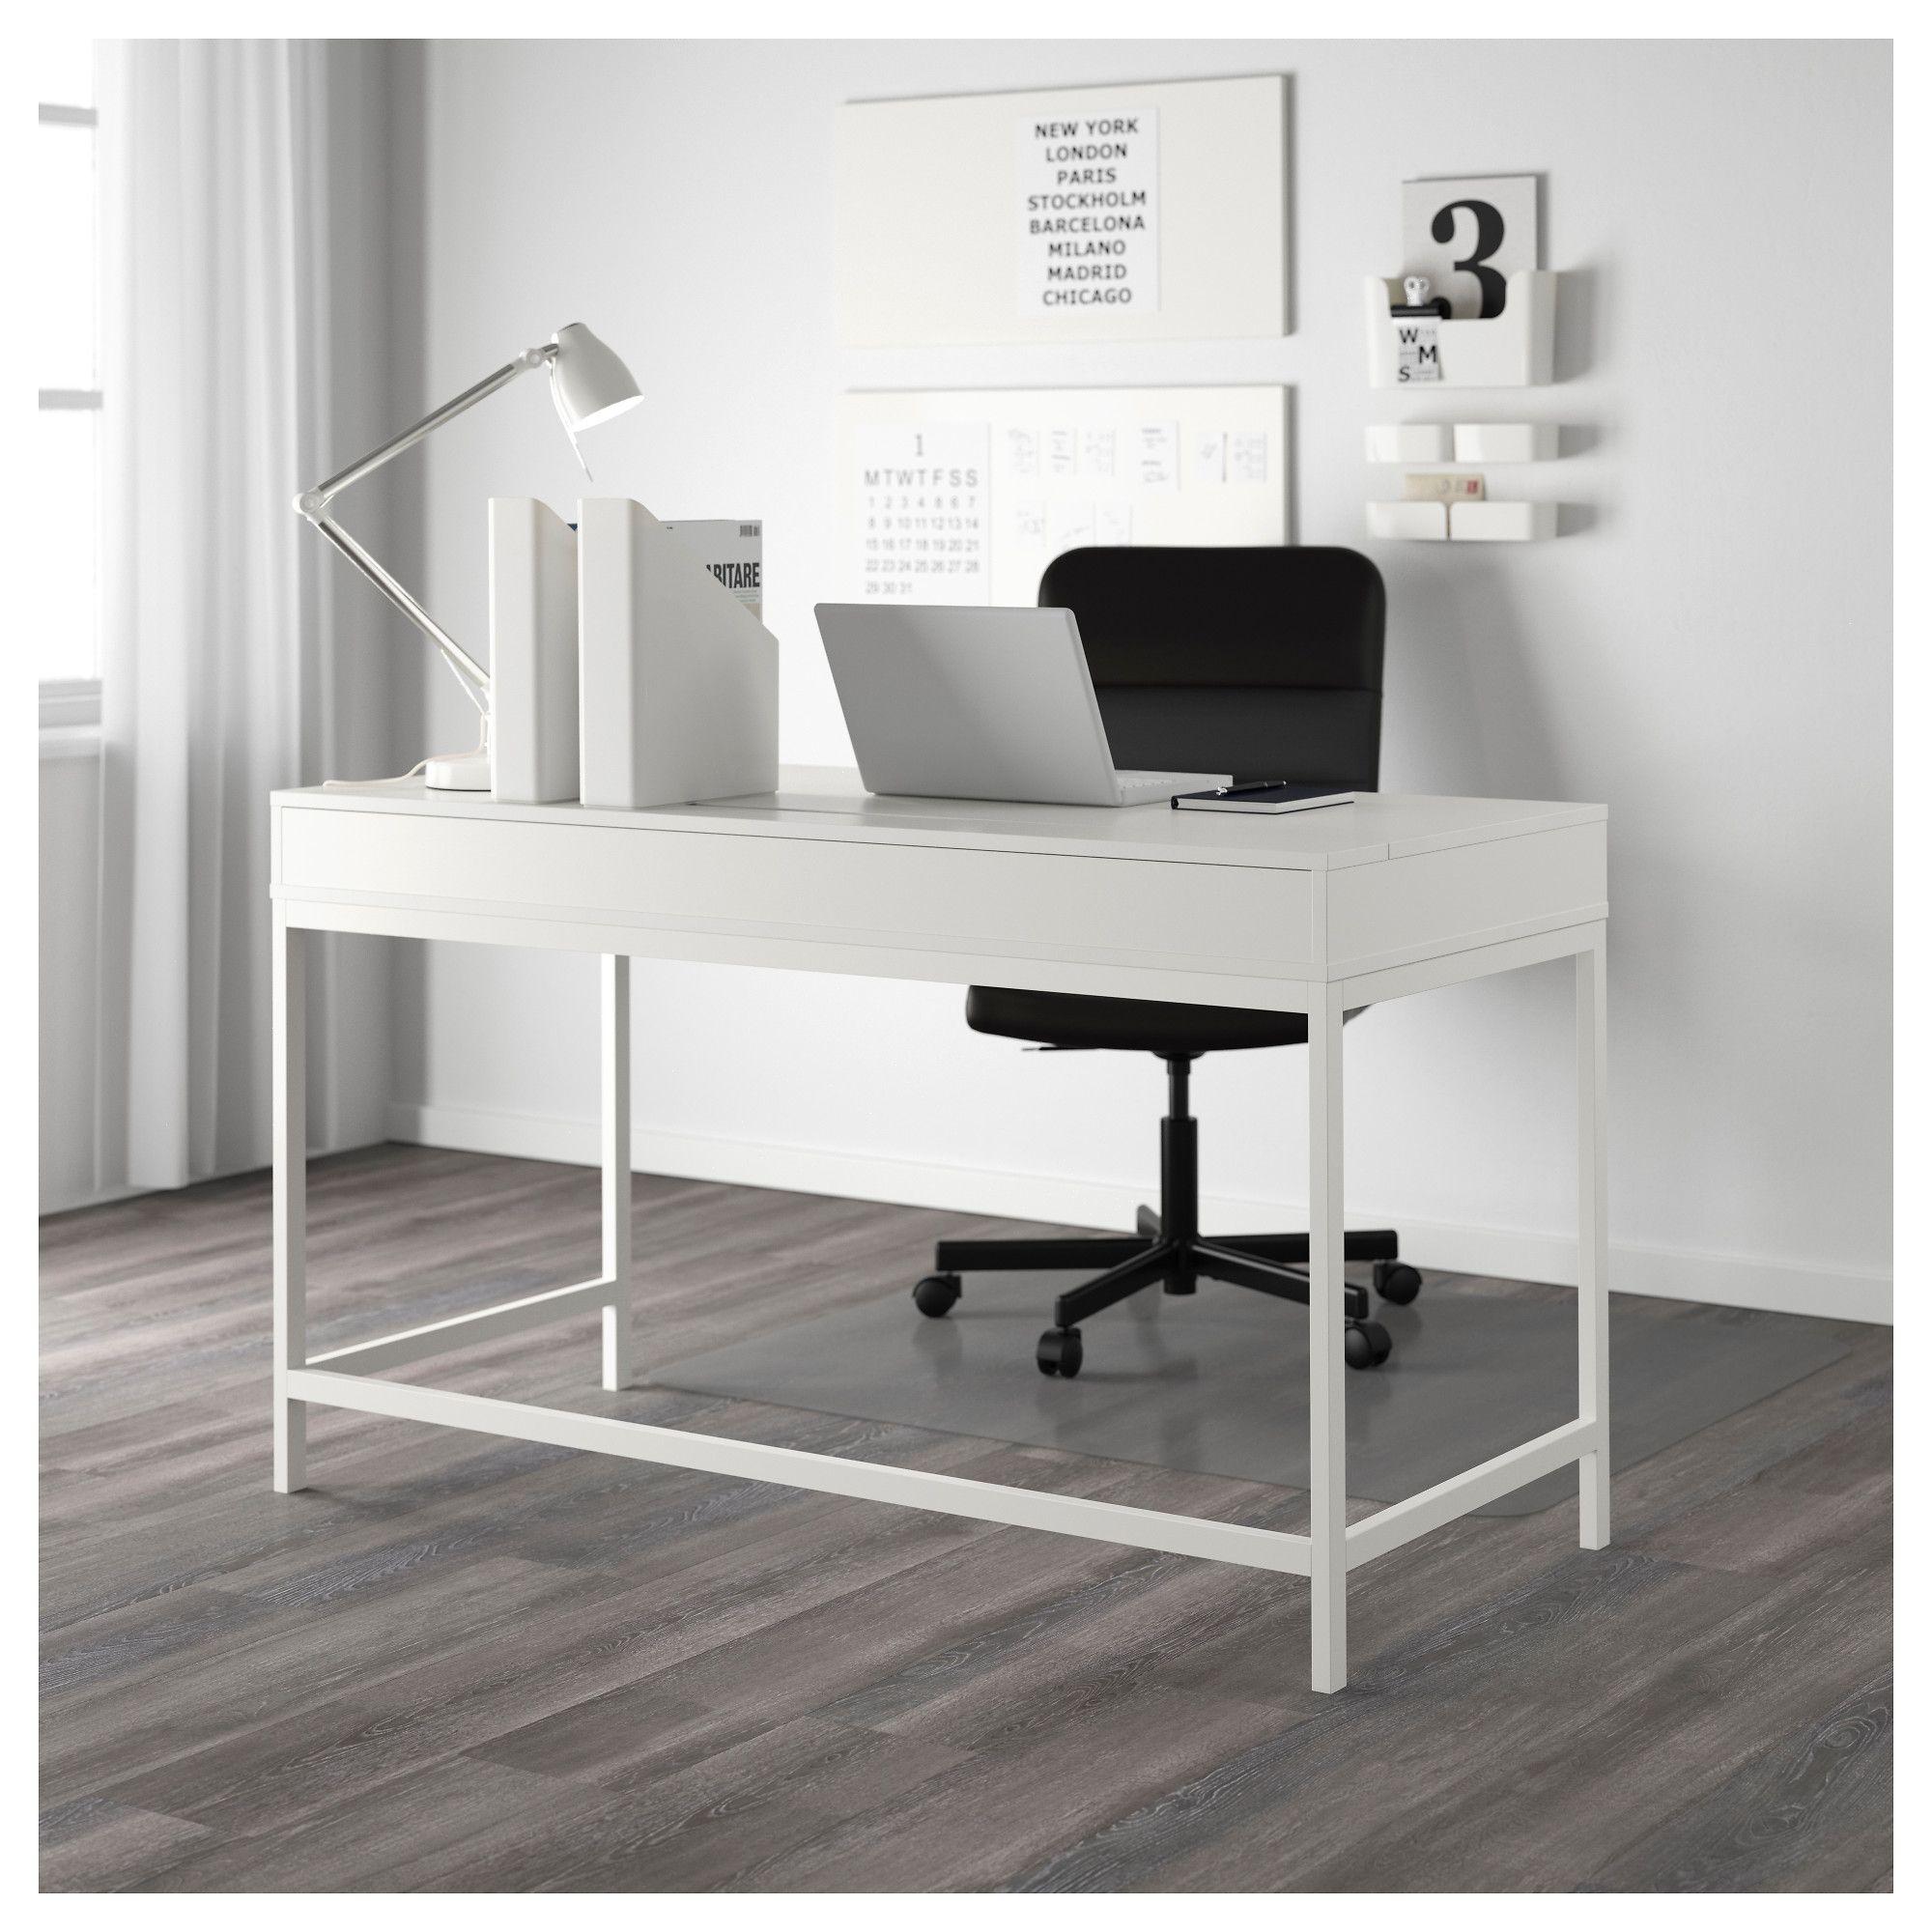 Ikea Alex Desk White Grey Desk Alex Desk White Desks